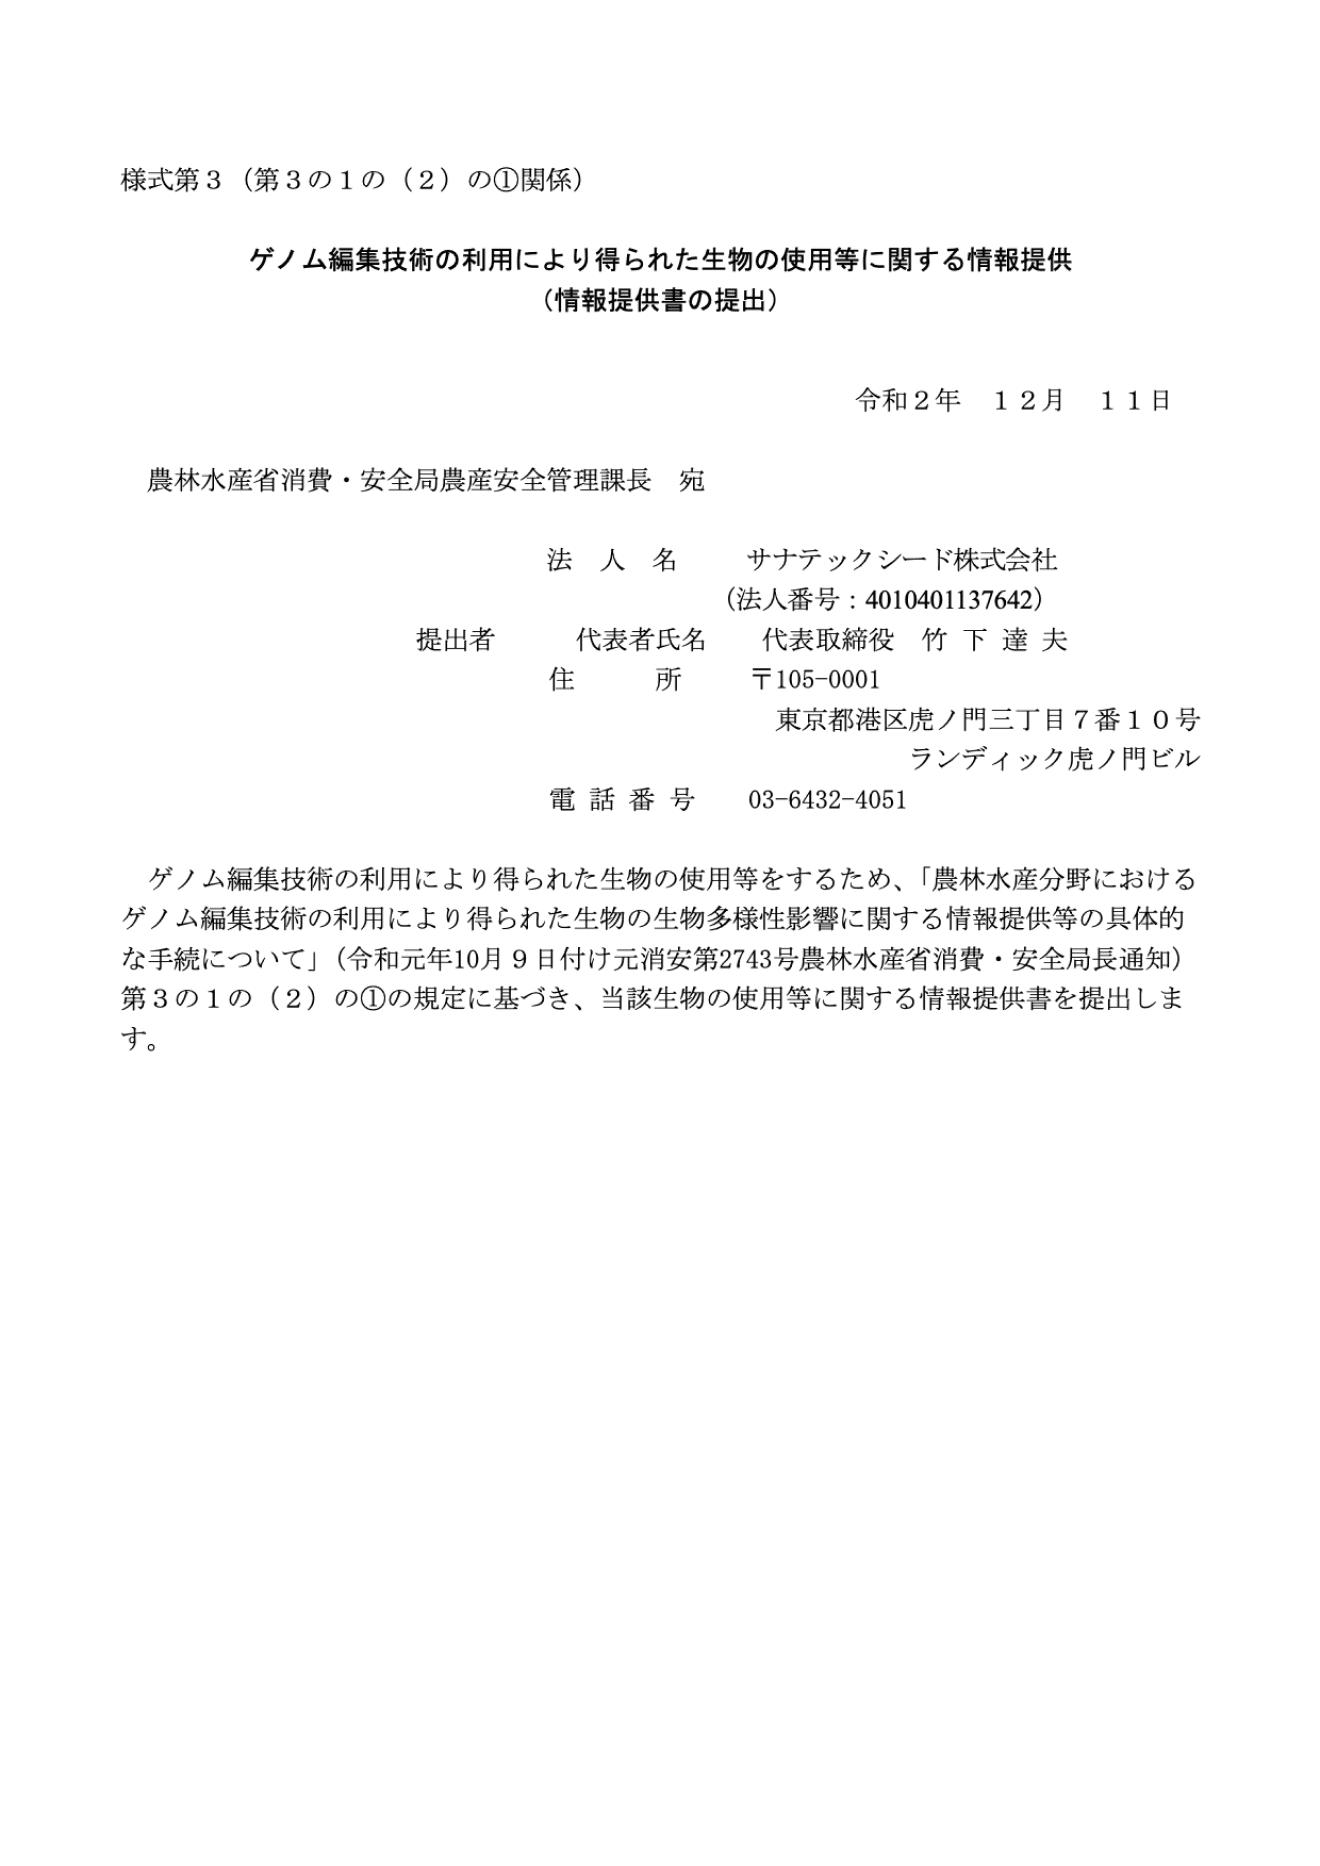 生物多様性影響に関する情報(所管官庁・環境省・農水省)